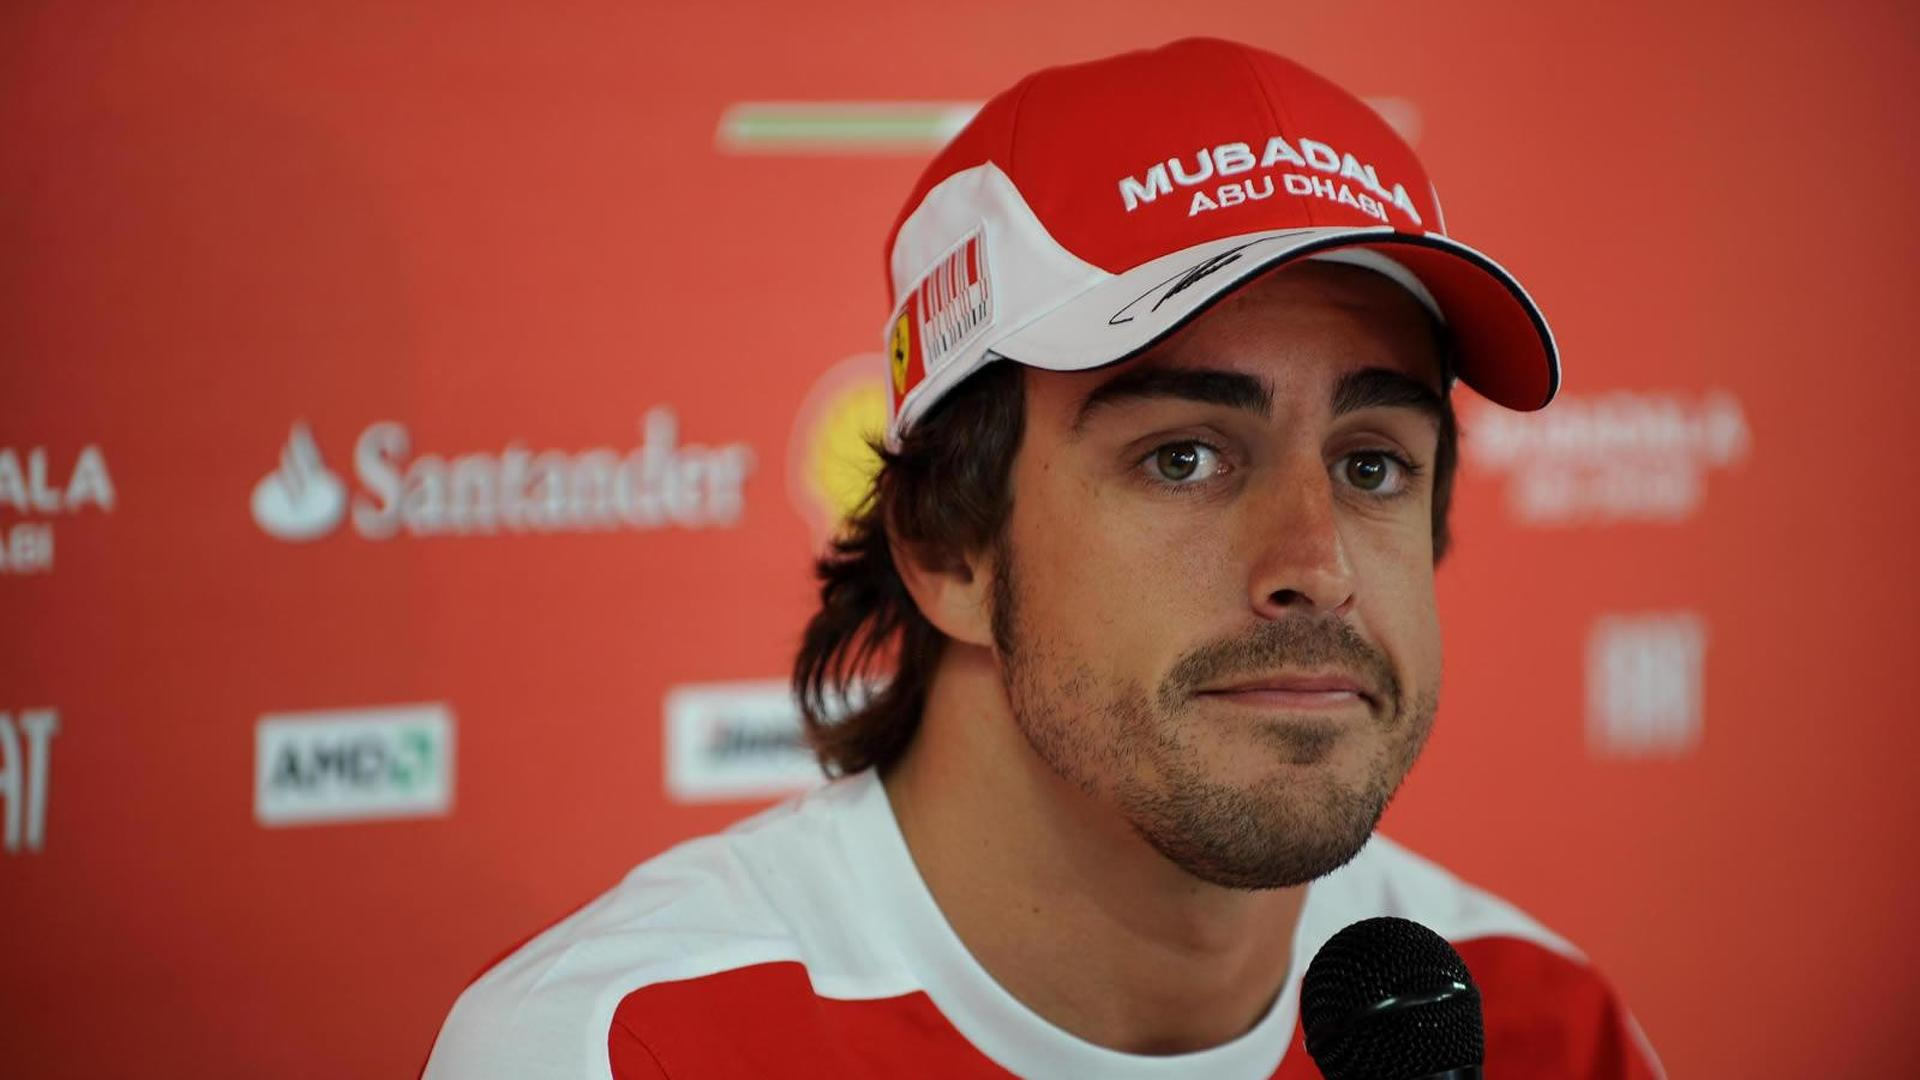 Heidfeld backs Alonso's penalty for Kubica pass